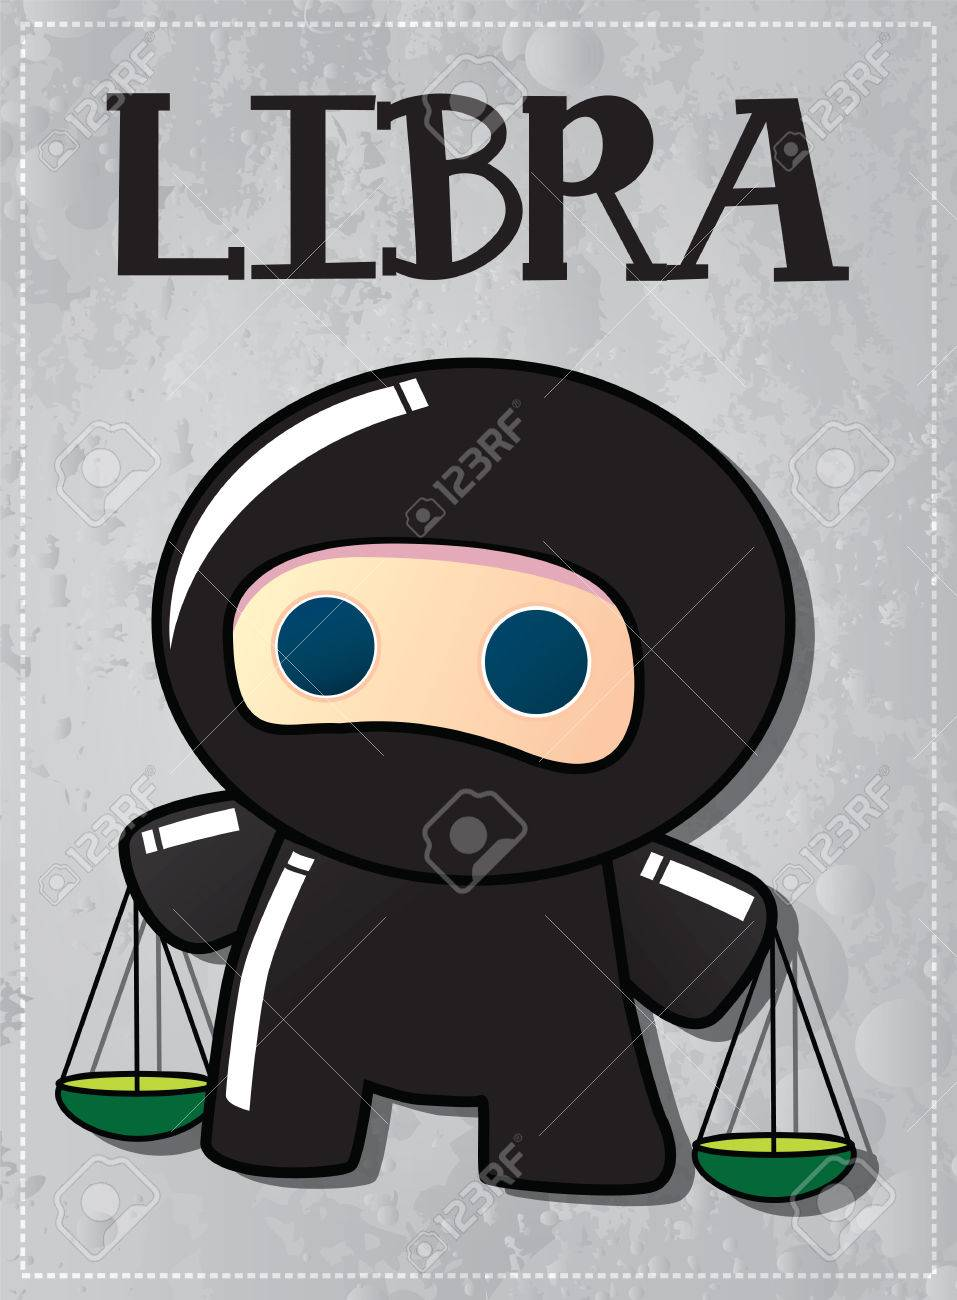 Zodiac sign Libra with cute black ninja character, vector Stock Vector - 24196809